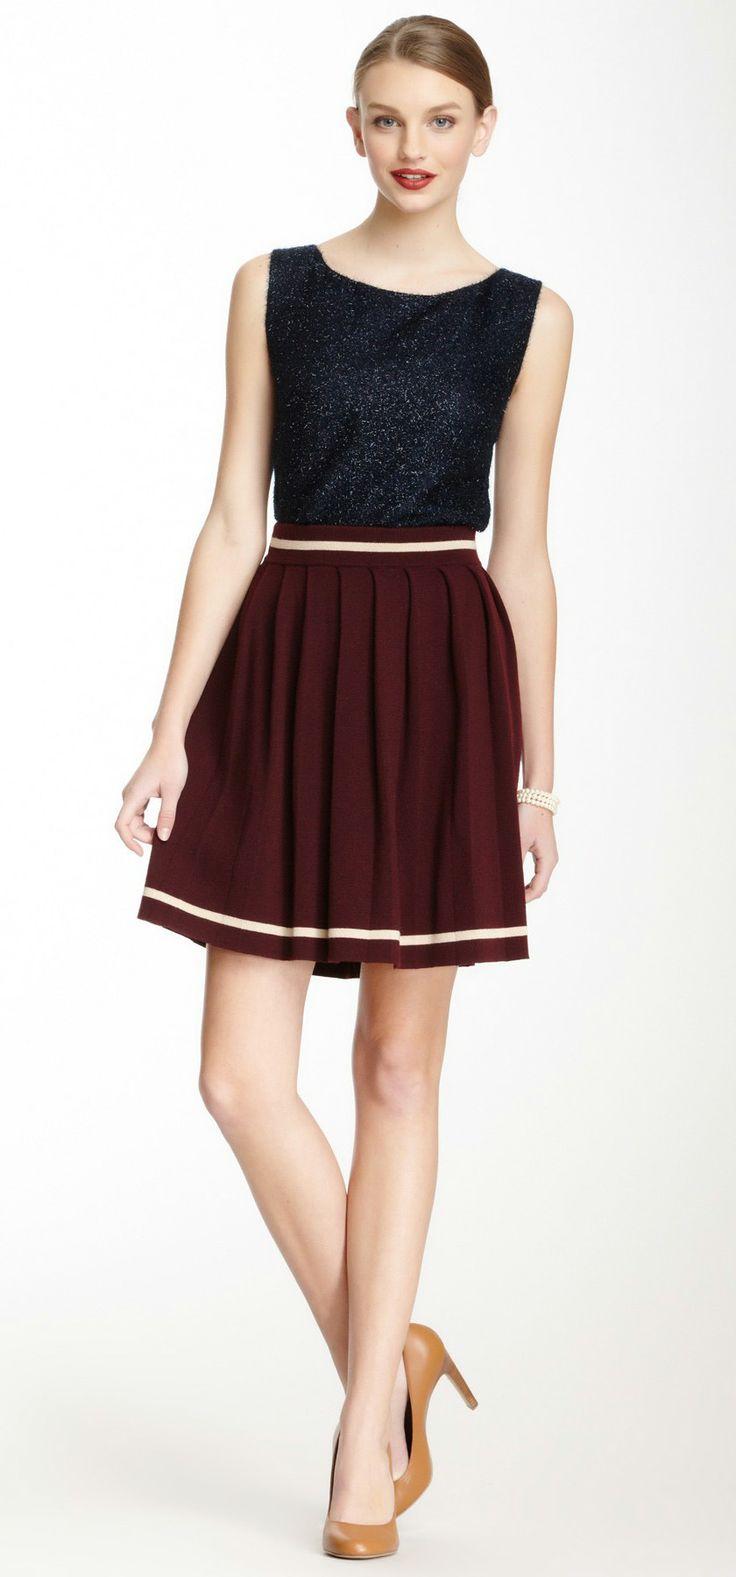 65 best Pretty Clothes images on Pinterest   Party dresses, Bridal ...